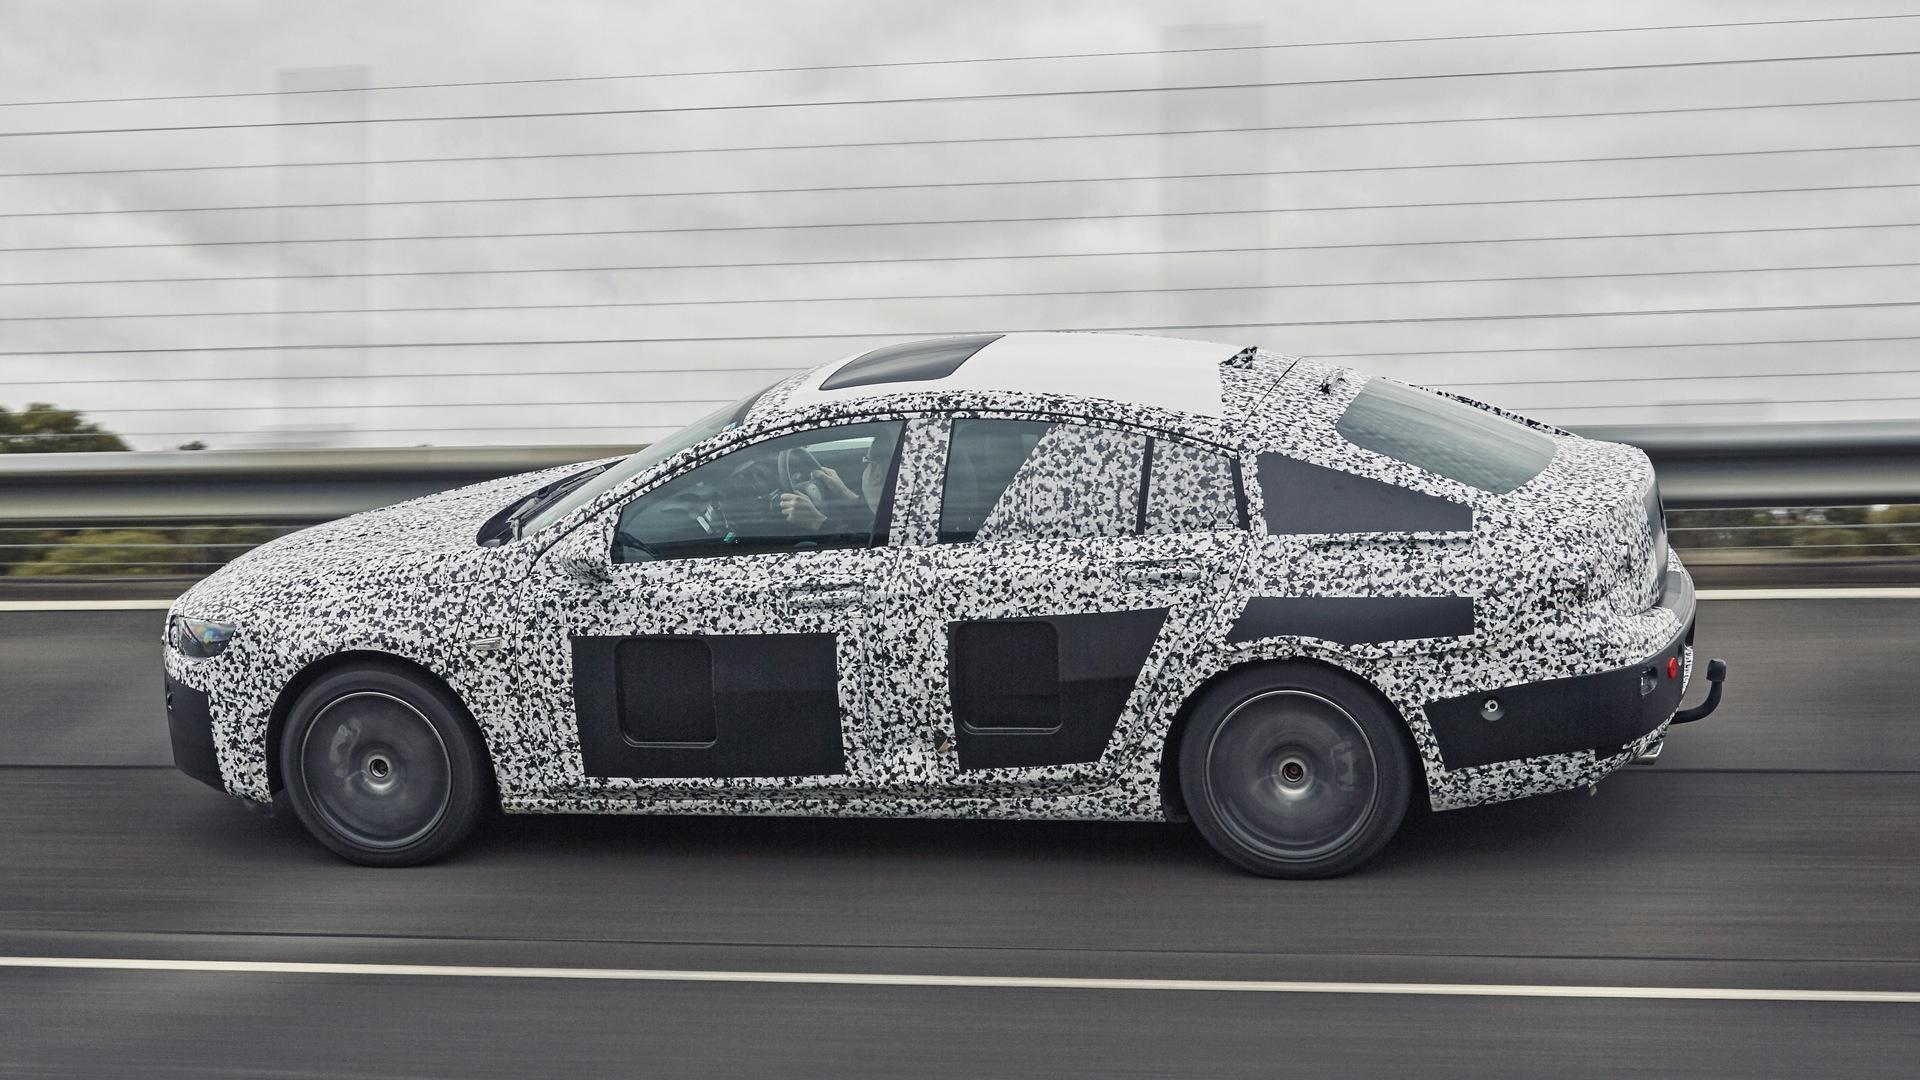 Teaser for 2018 Holden Commodore